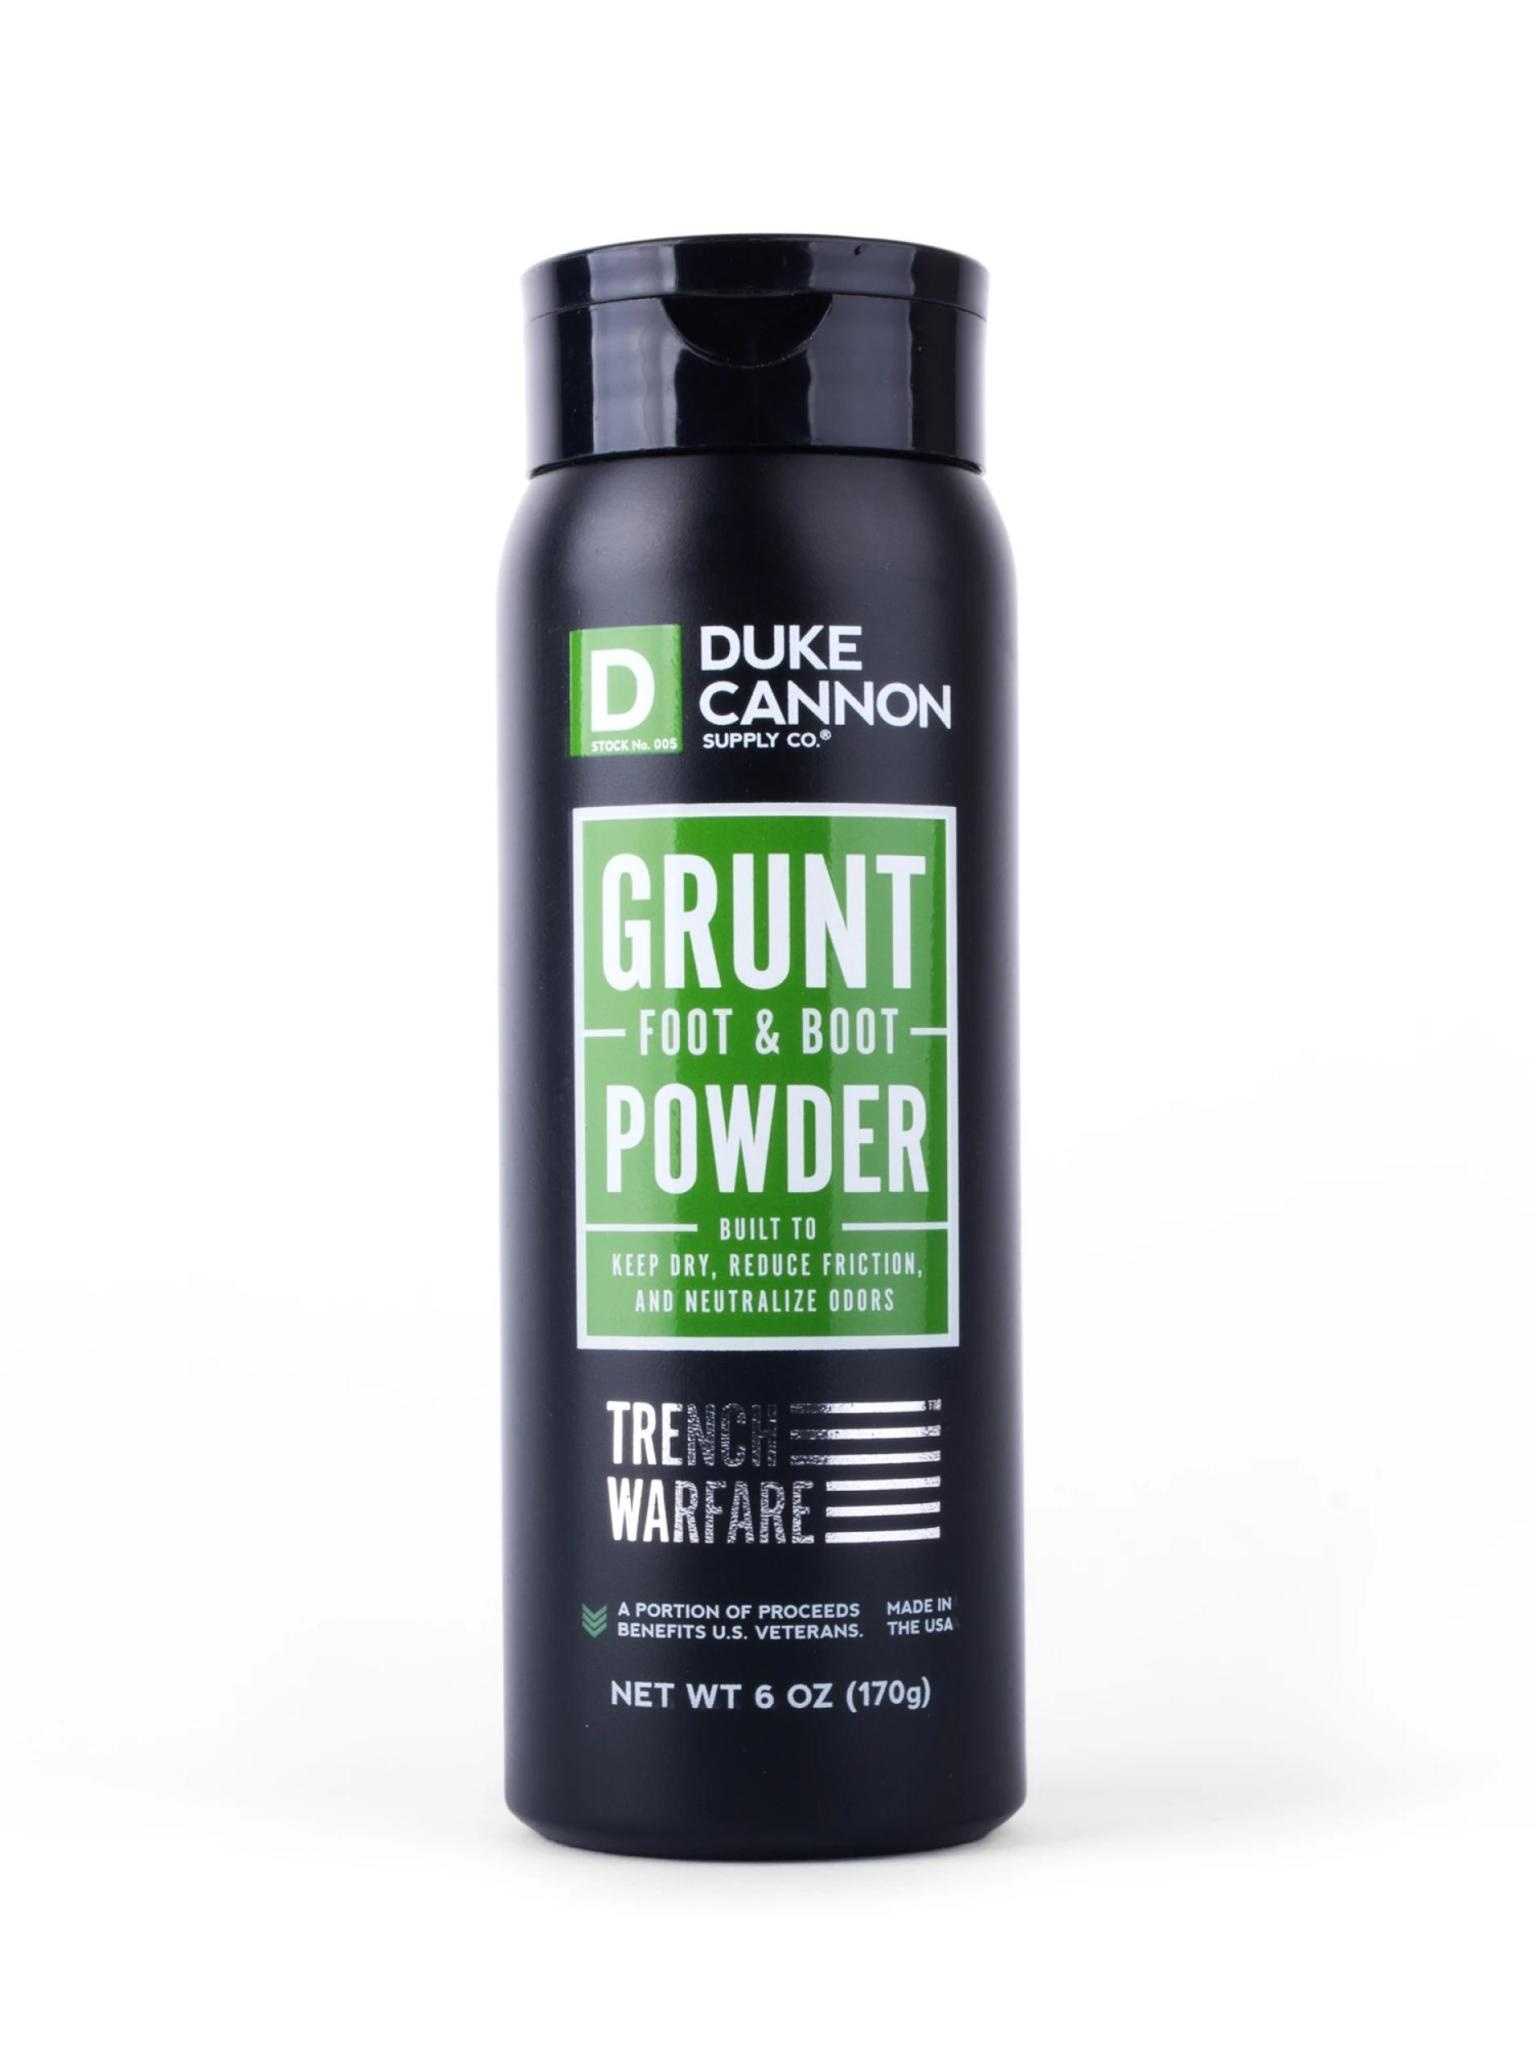 Duke Cannon Supply Co Grunt Foot & Boot Powder